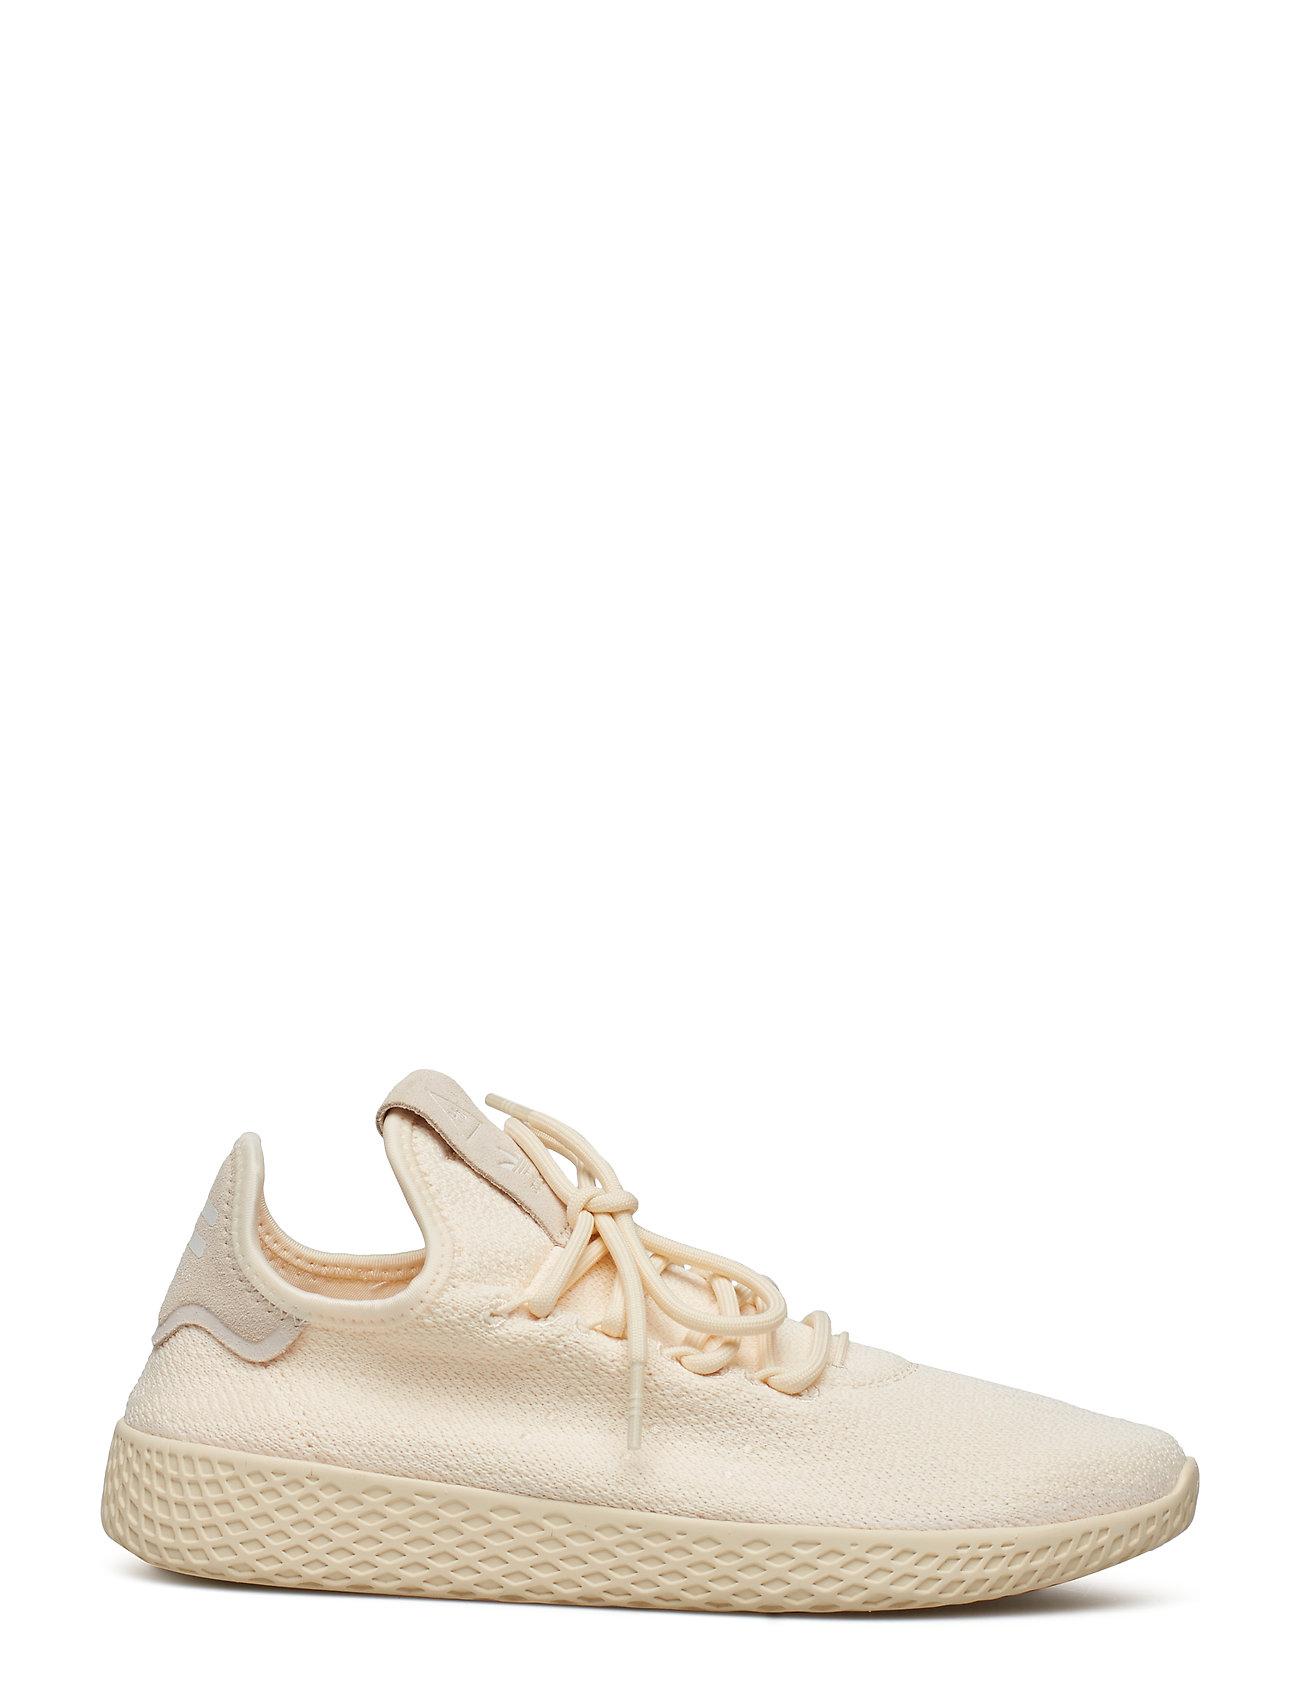 Pw Tennis Hu W Low top Sneakers Creme Adidas Originals